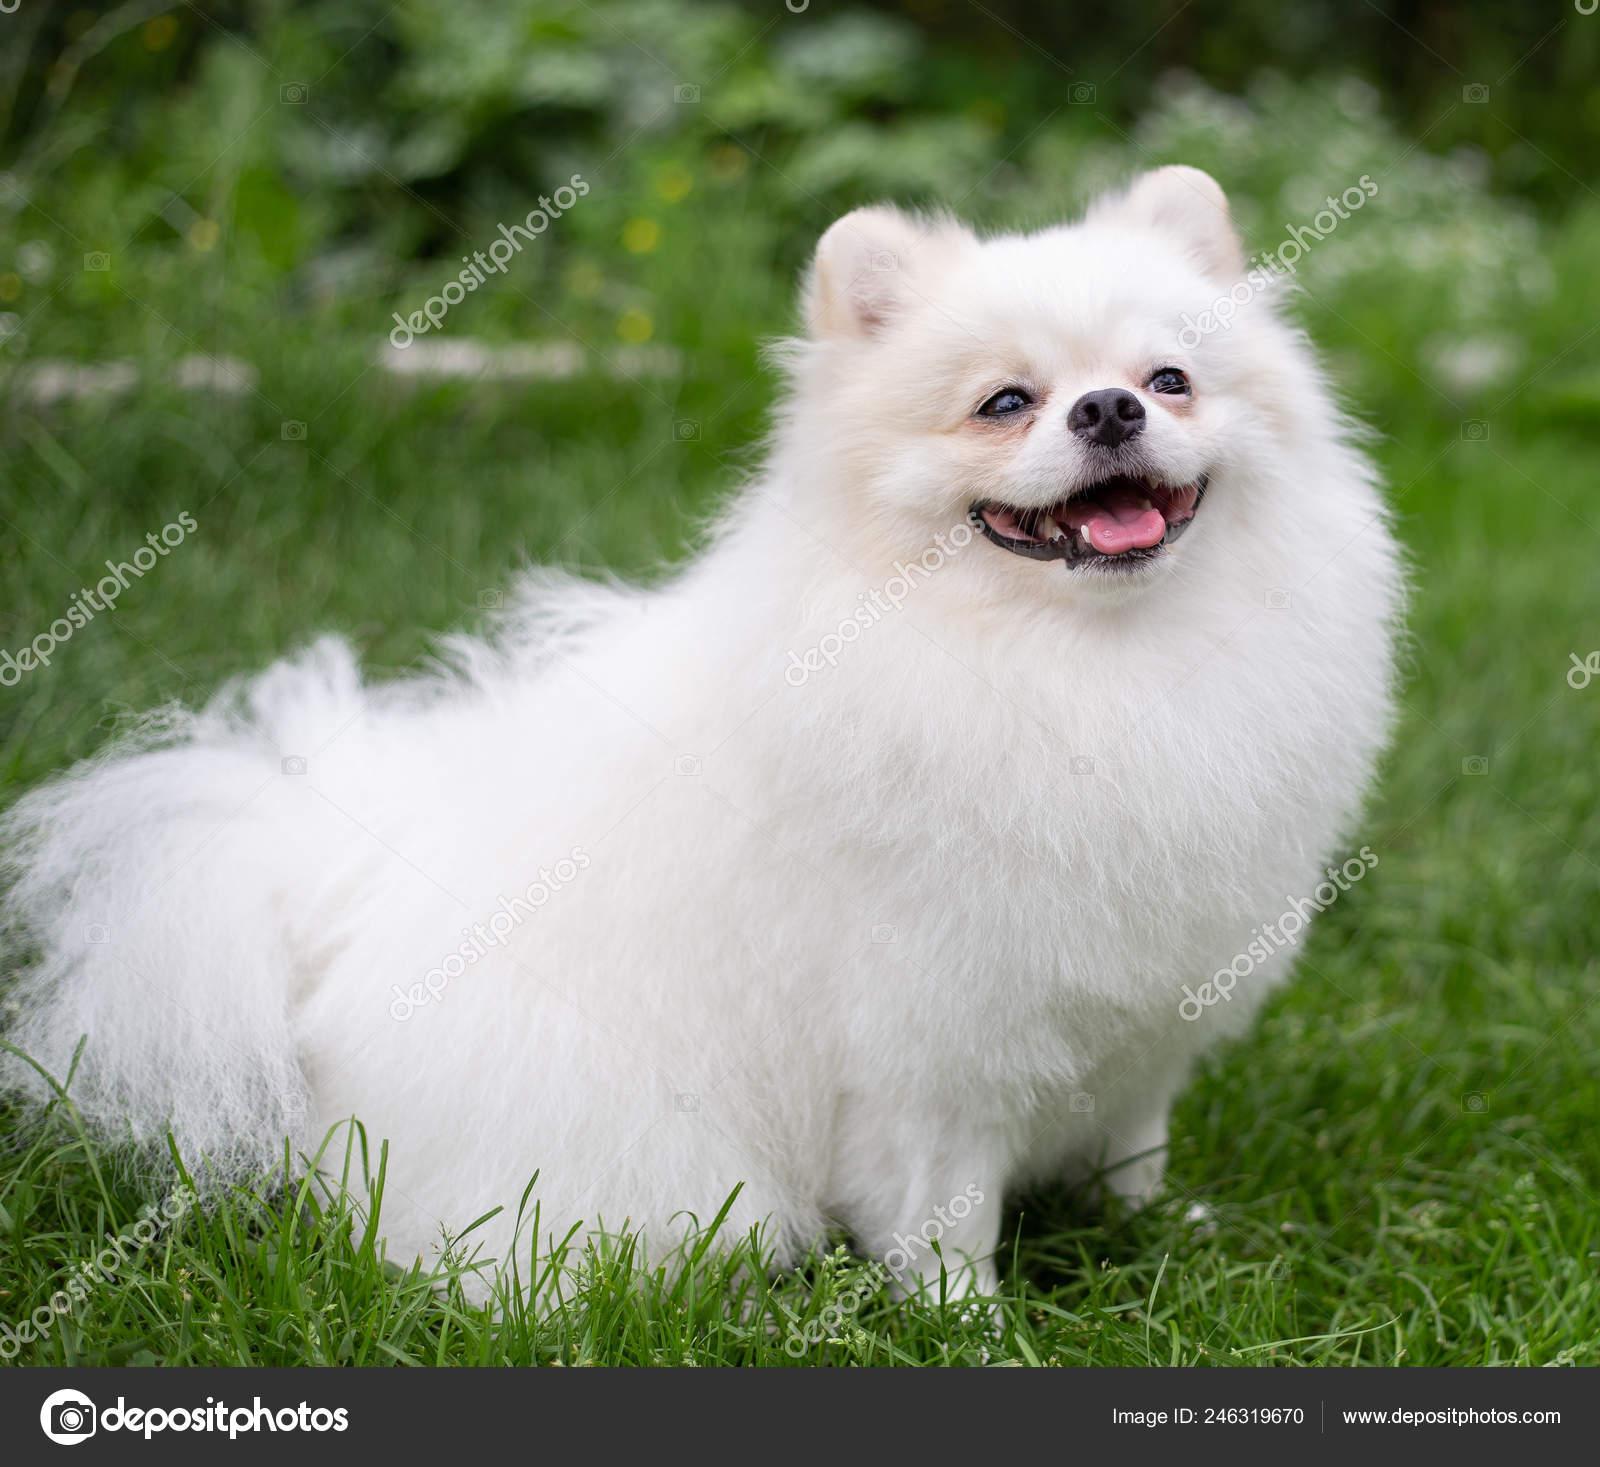 Beautiful White Dog Pomeranian Spitz Pomeranian Puppy Dog Cute Pet Happy Smile Playing In Nature Stock Photo C Stori 246319670